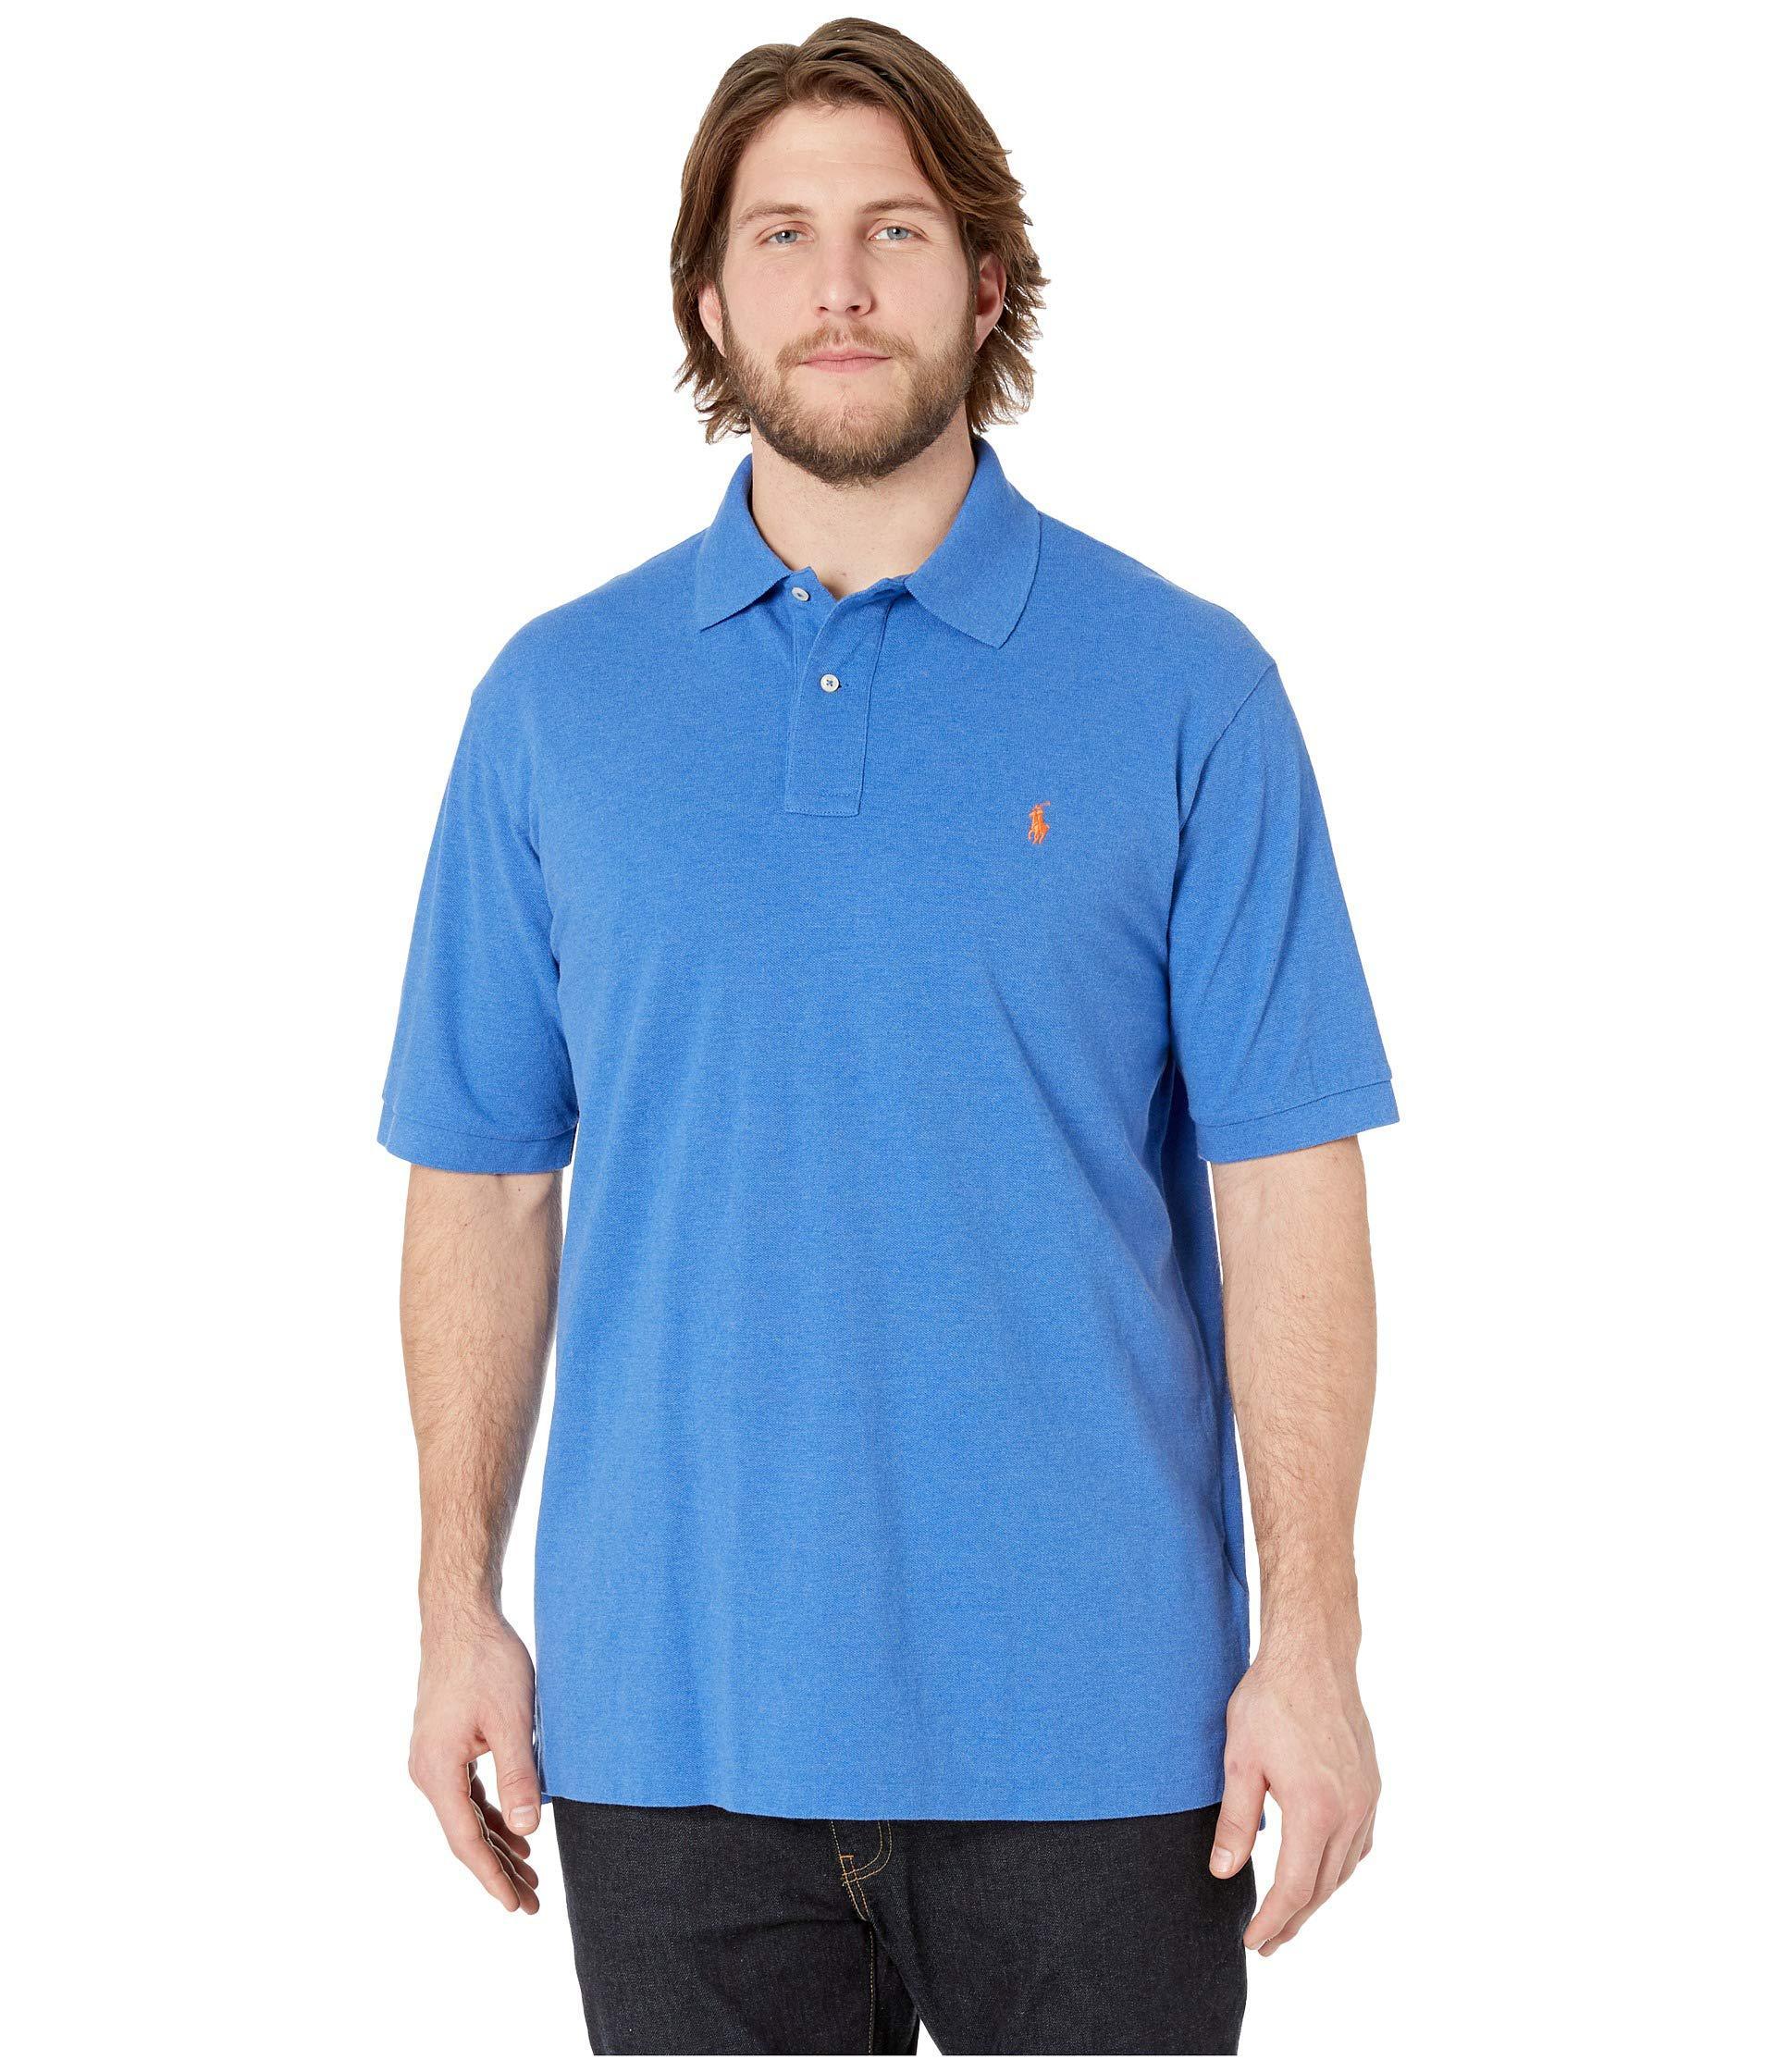 5621ec23f5d7 Polo Ralph Lauren Big Tall Basic Mesh Short Sleeve Custom Slim Fit ...